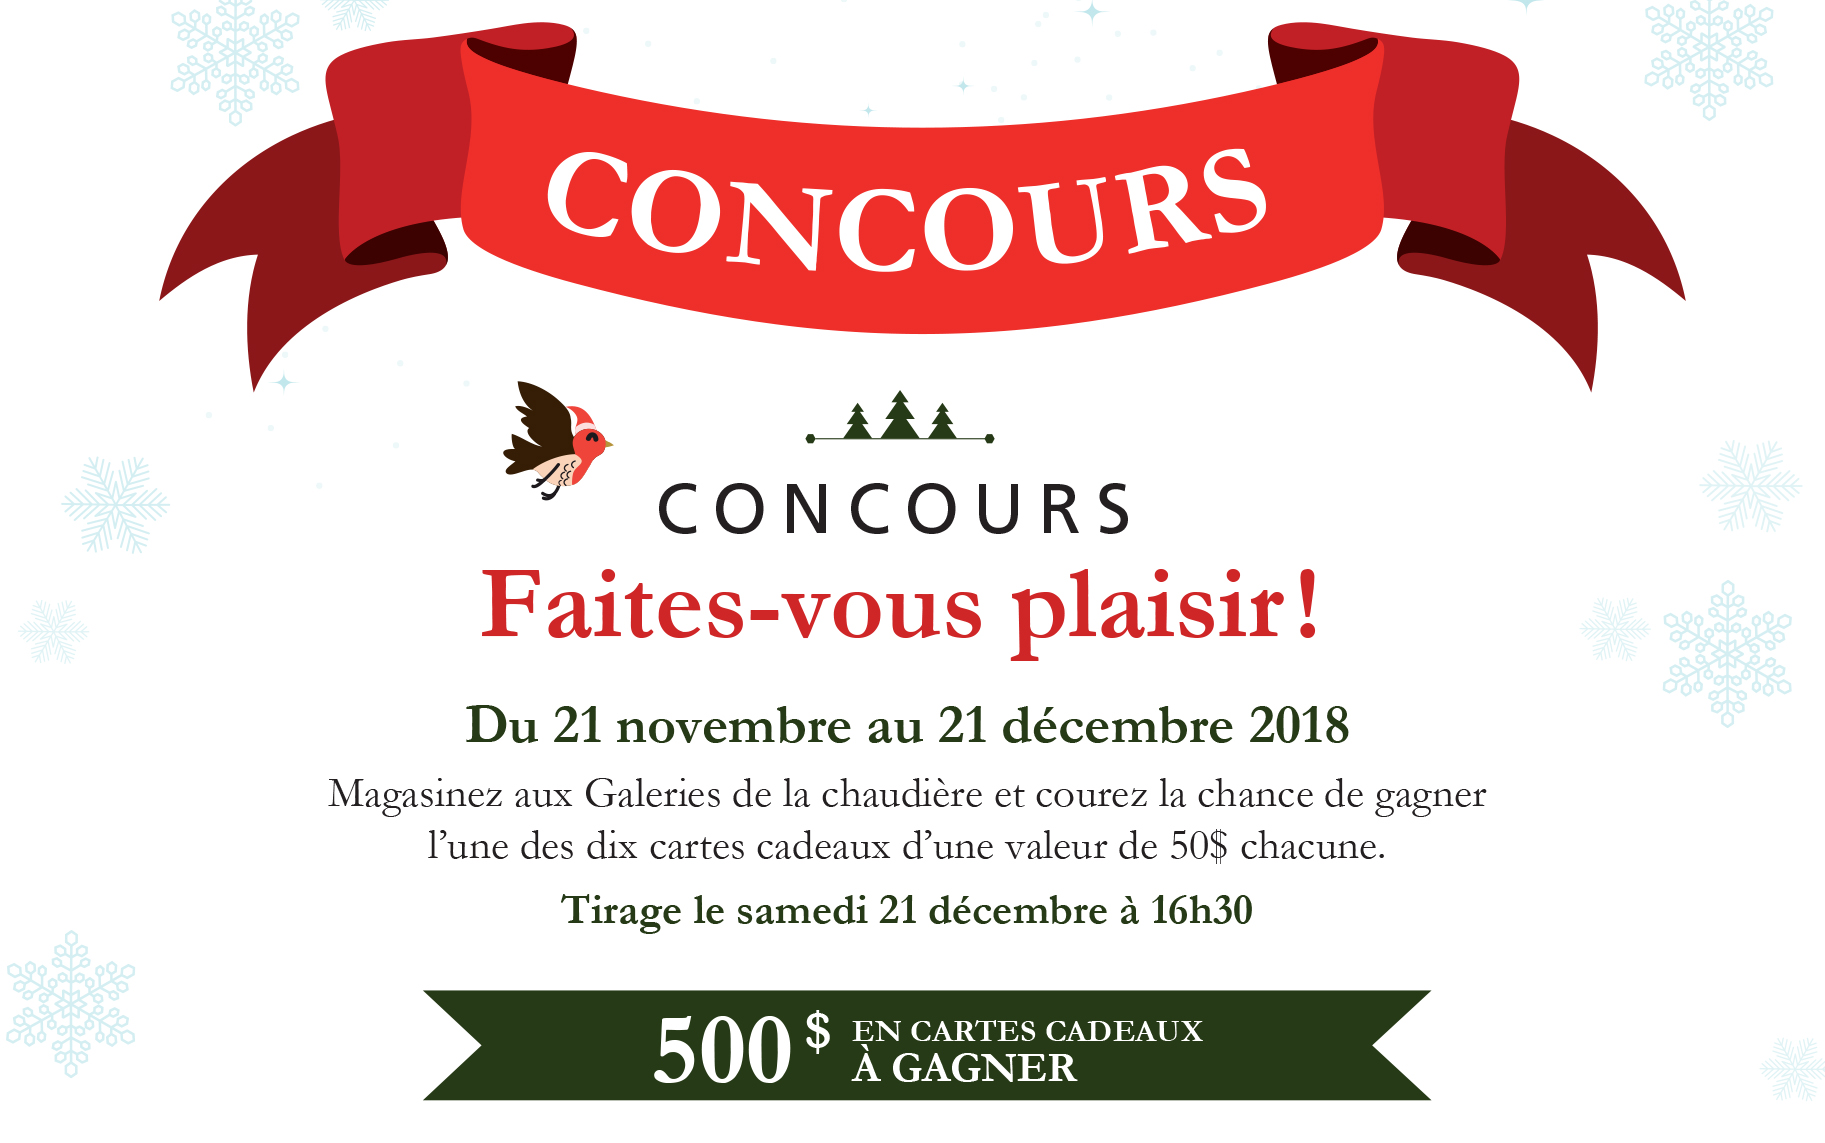 GaleriesdelaChaudiere_Concours_web